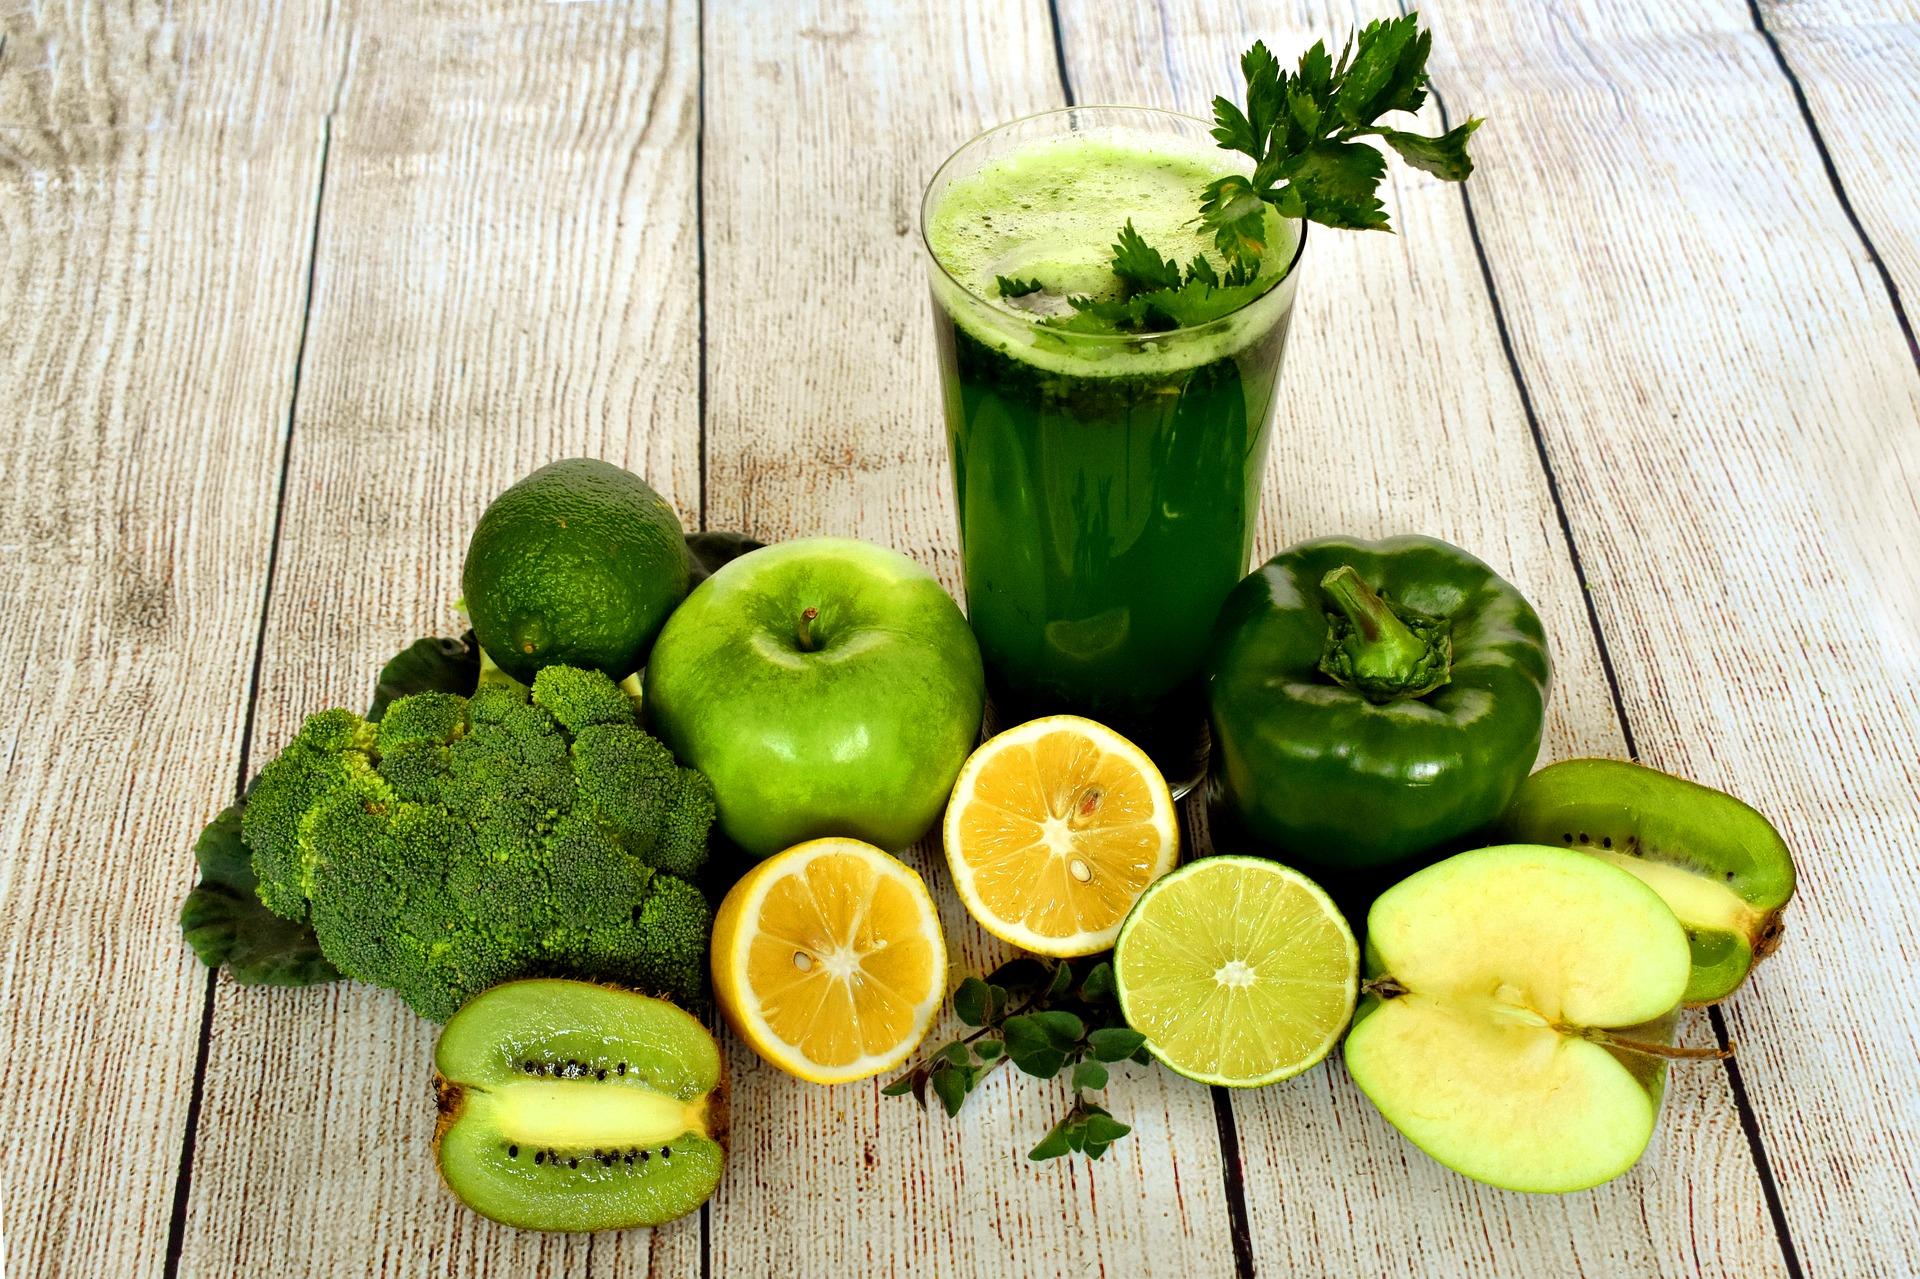 Suco verde detox: Por que tomar?